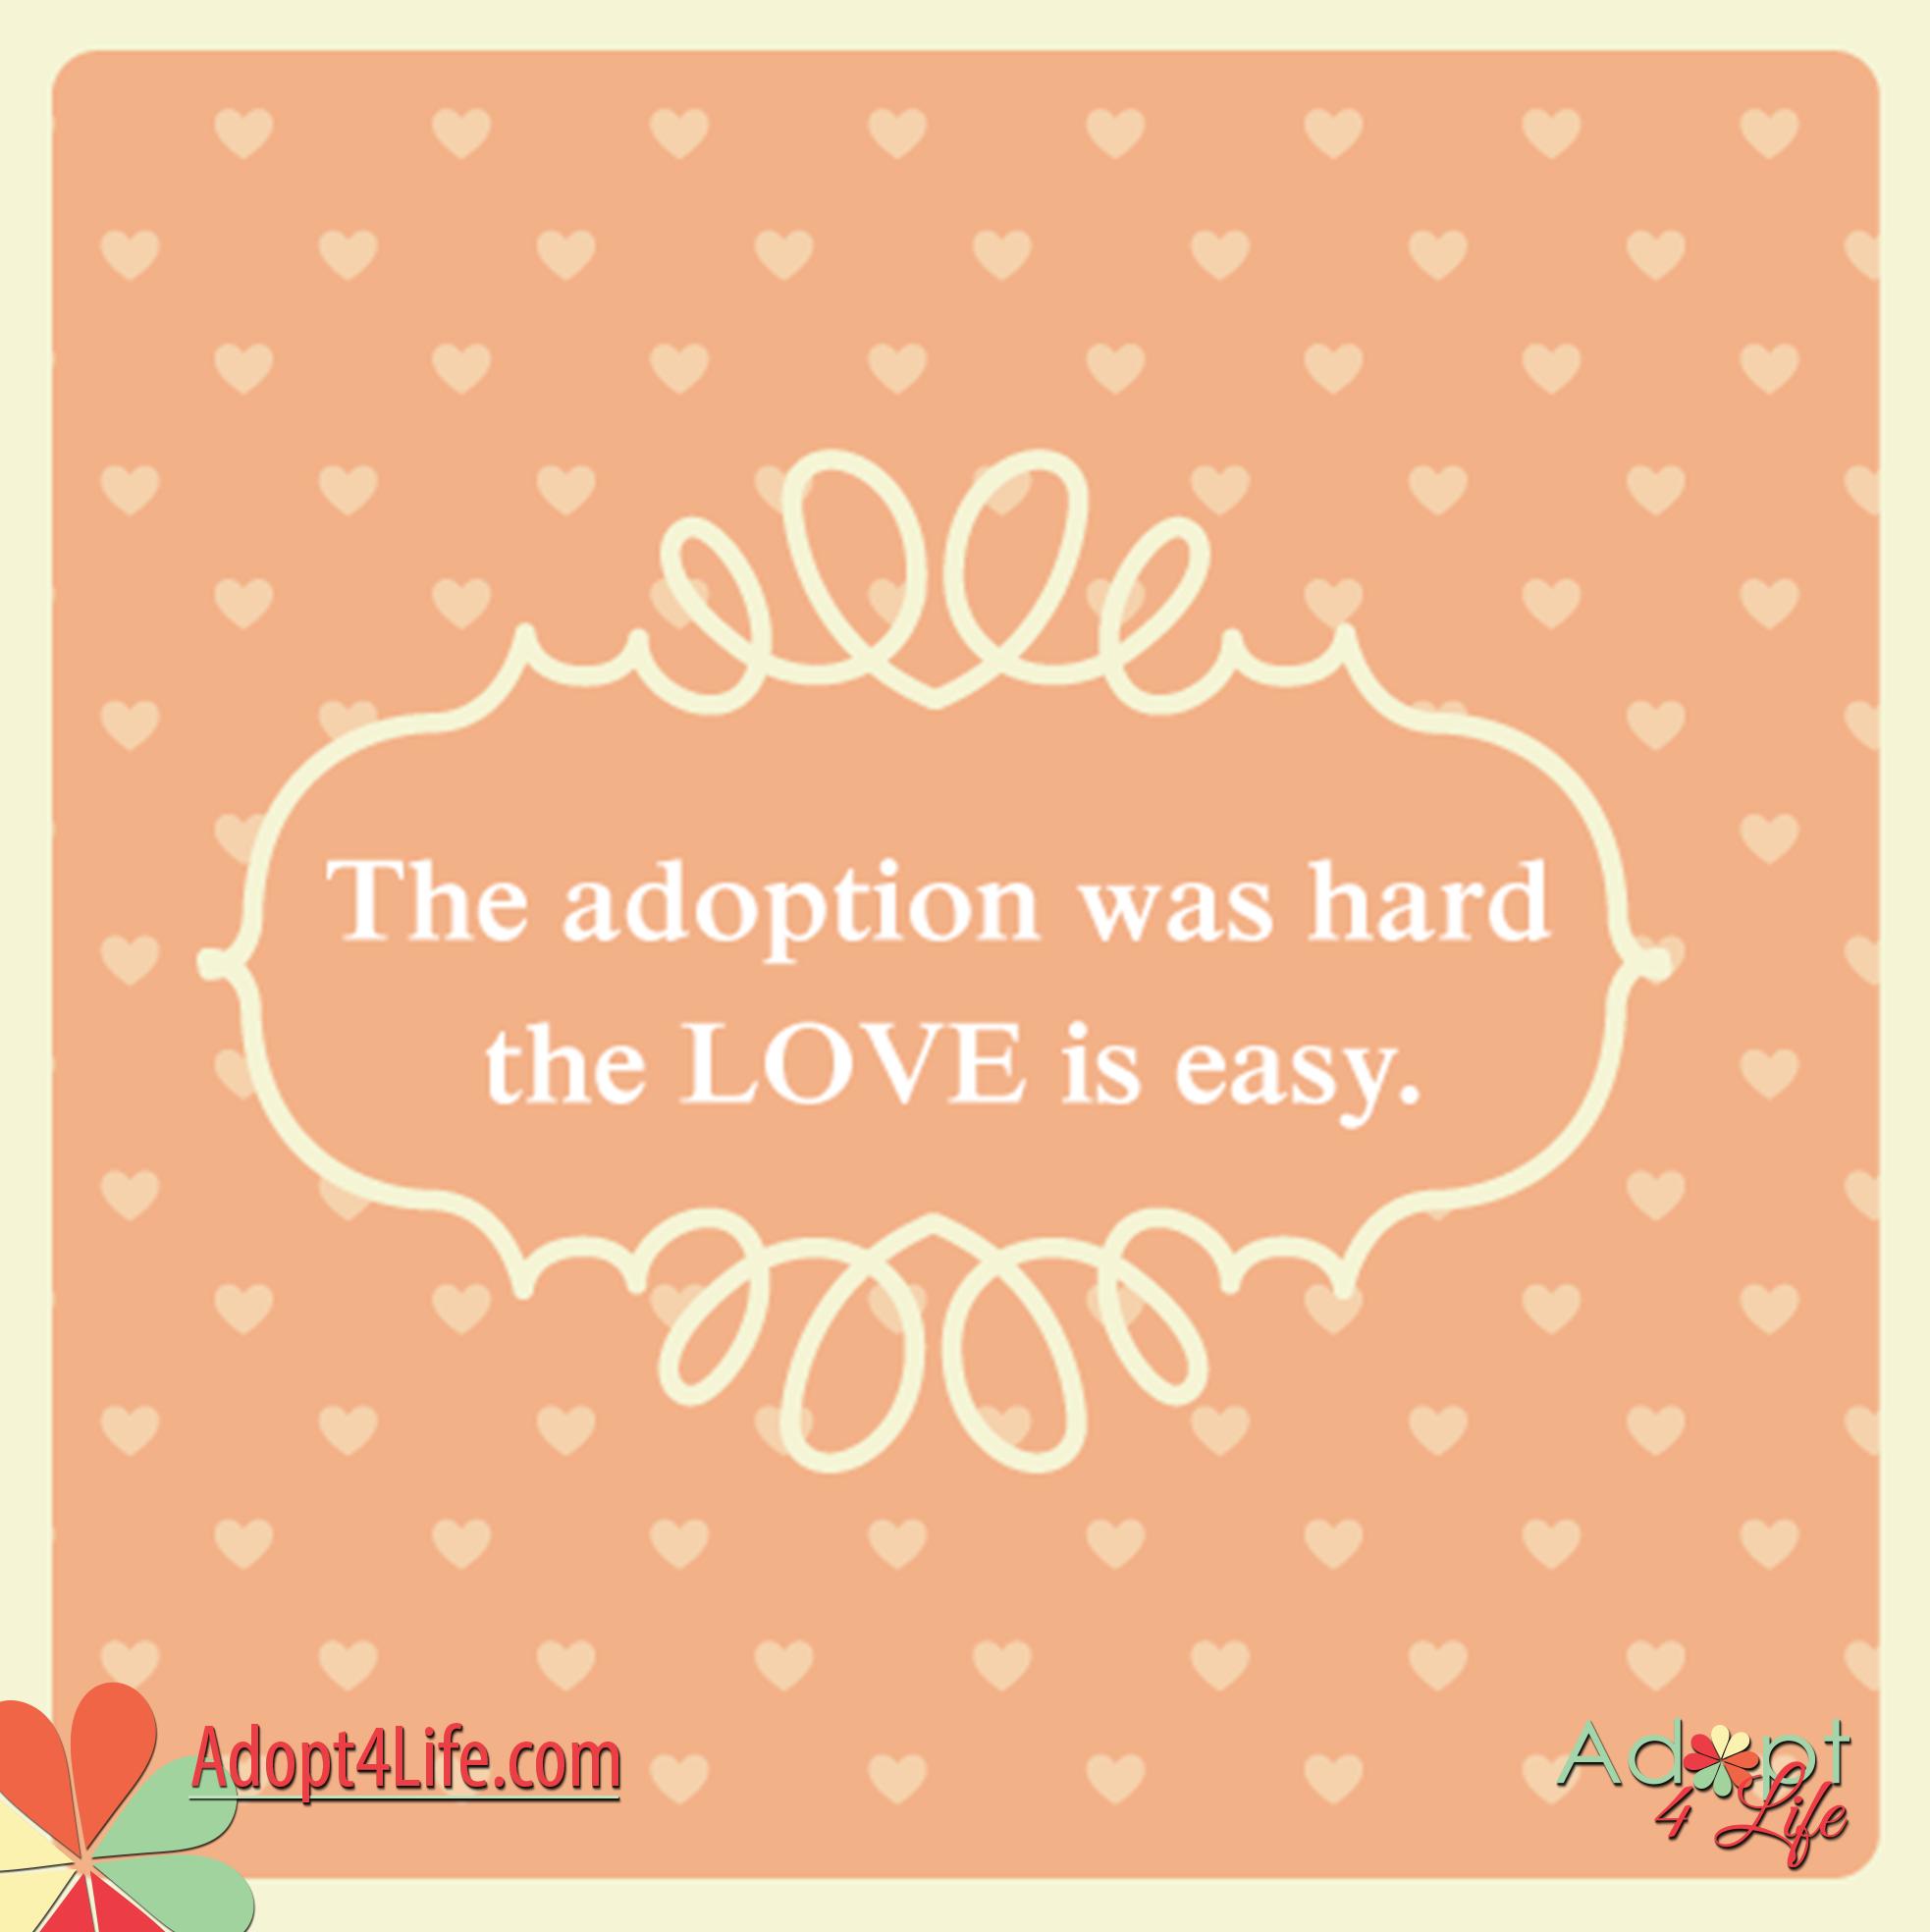 FacebookAdoptionQuotes_Adoption_011_png_Dec2014.png